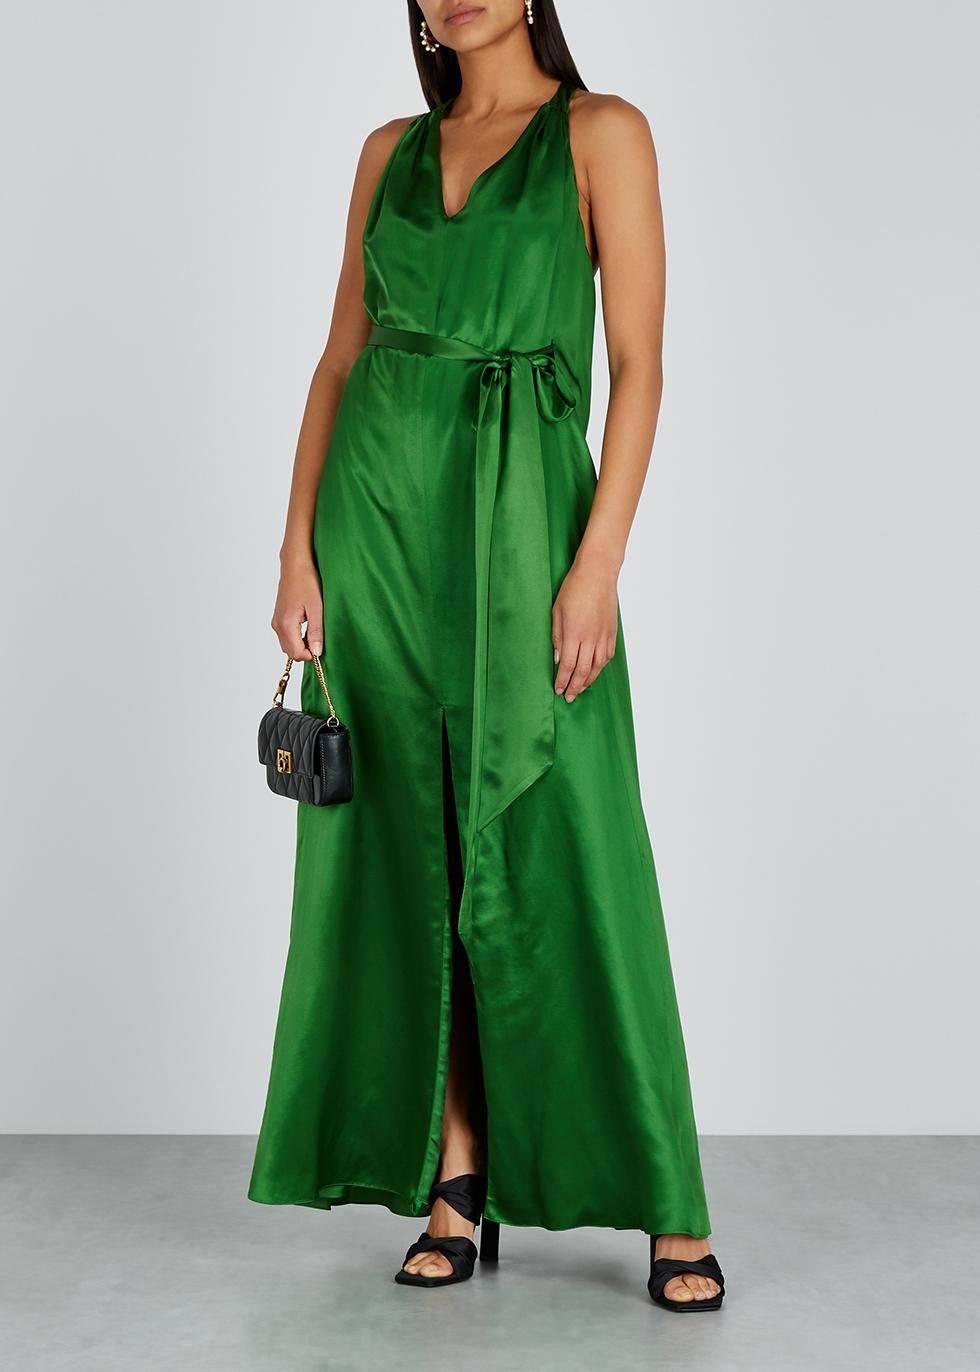 Darling emerald green satin maxi dress - Temperley